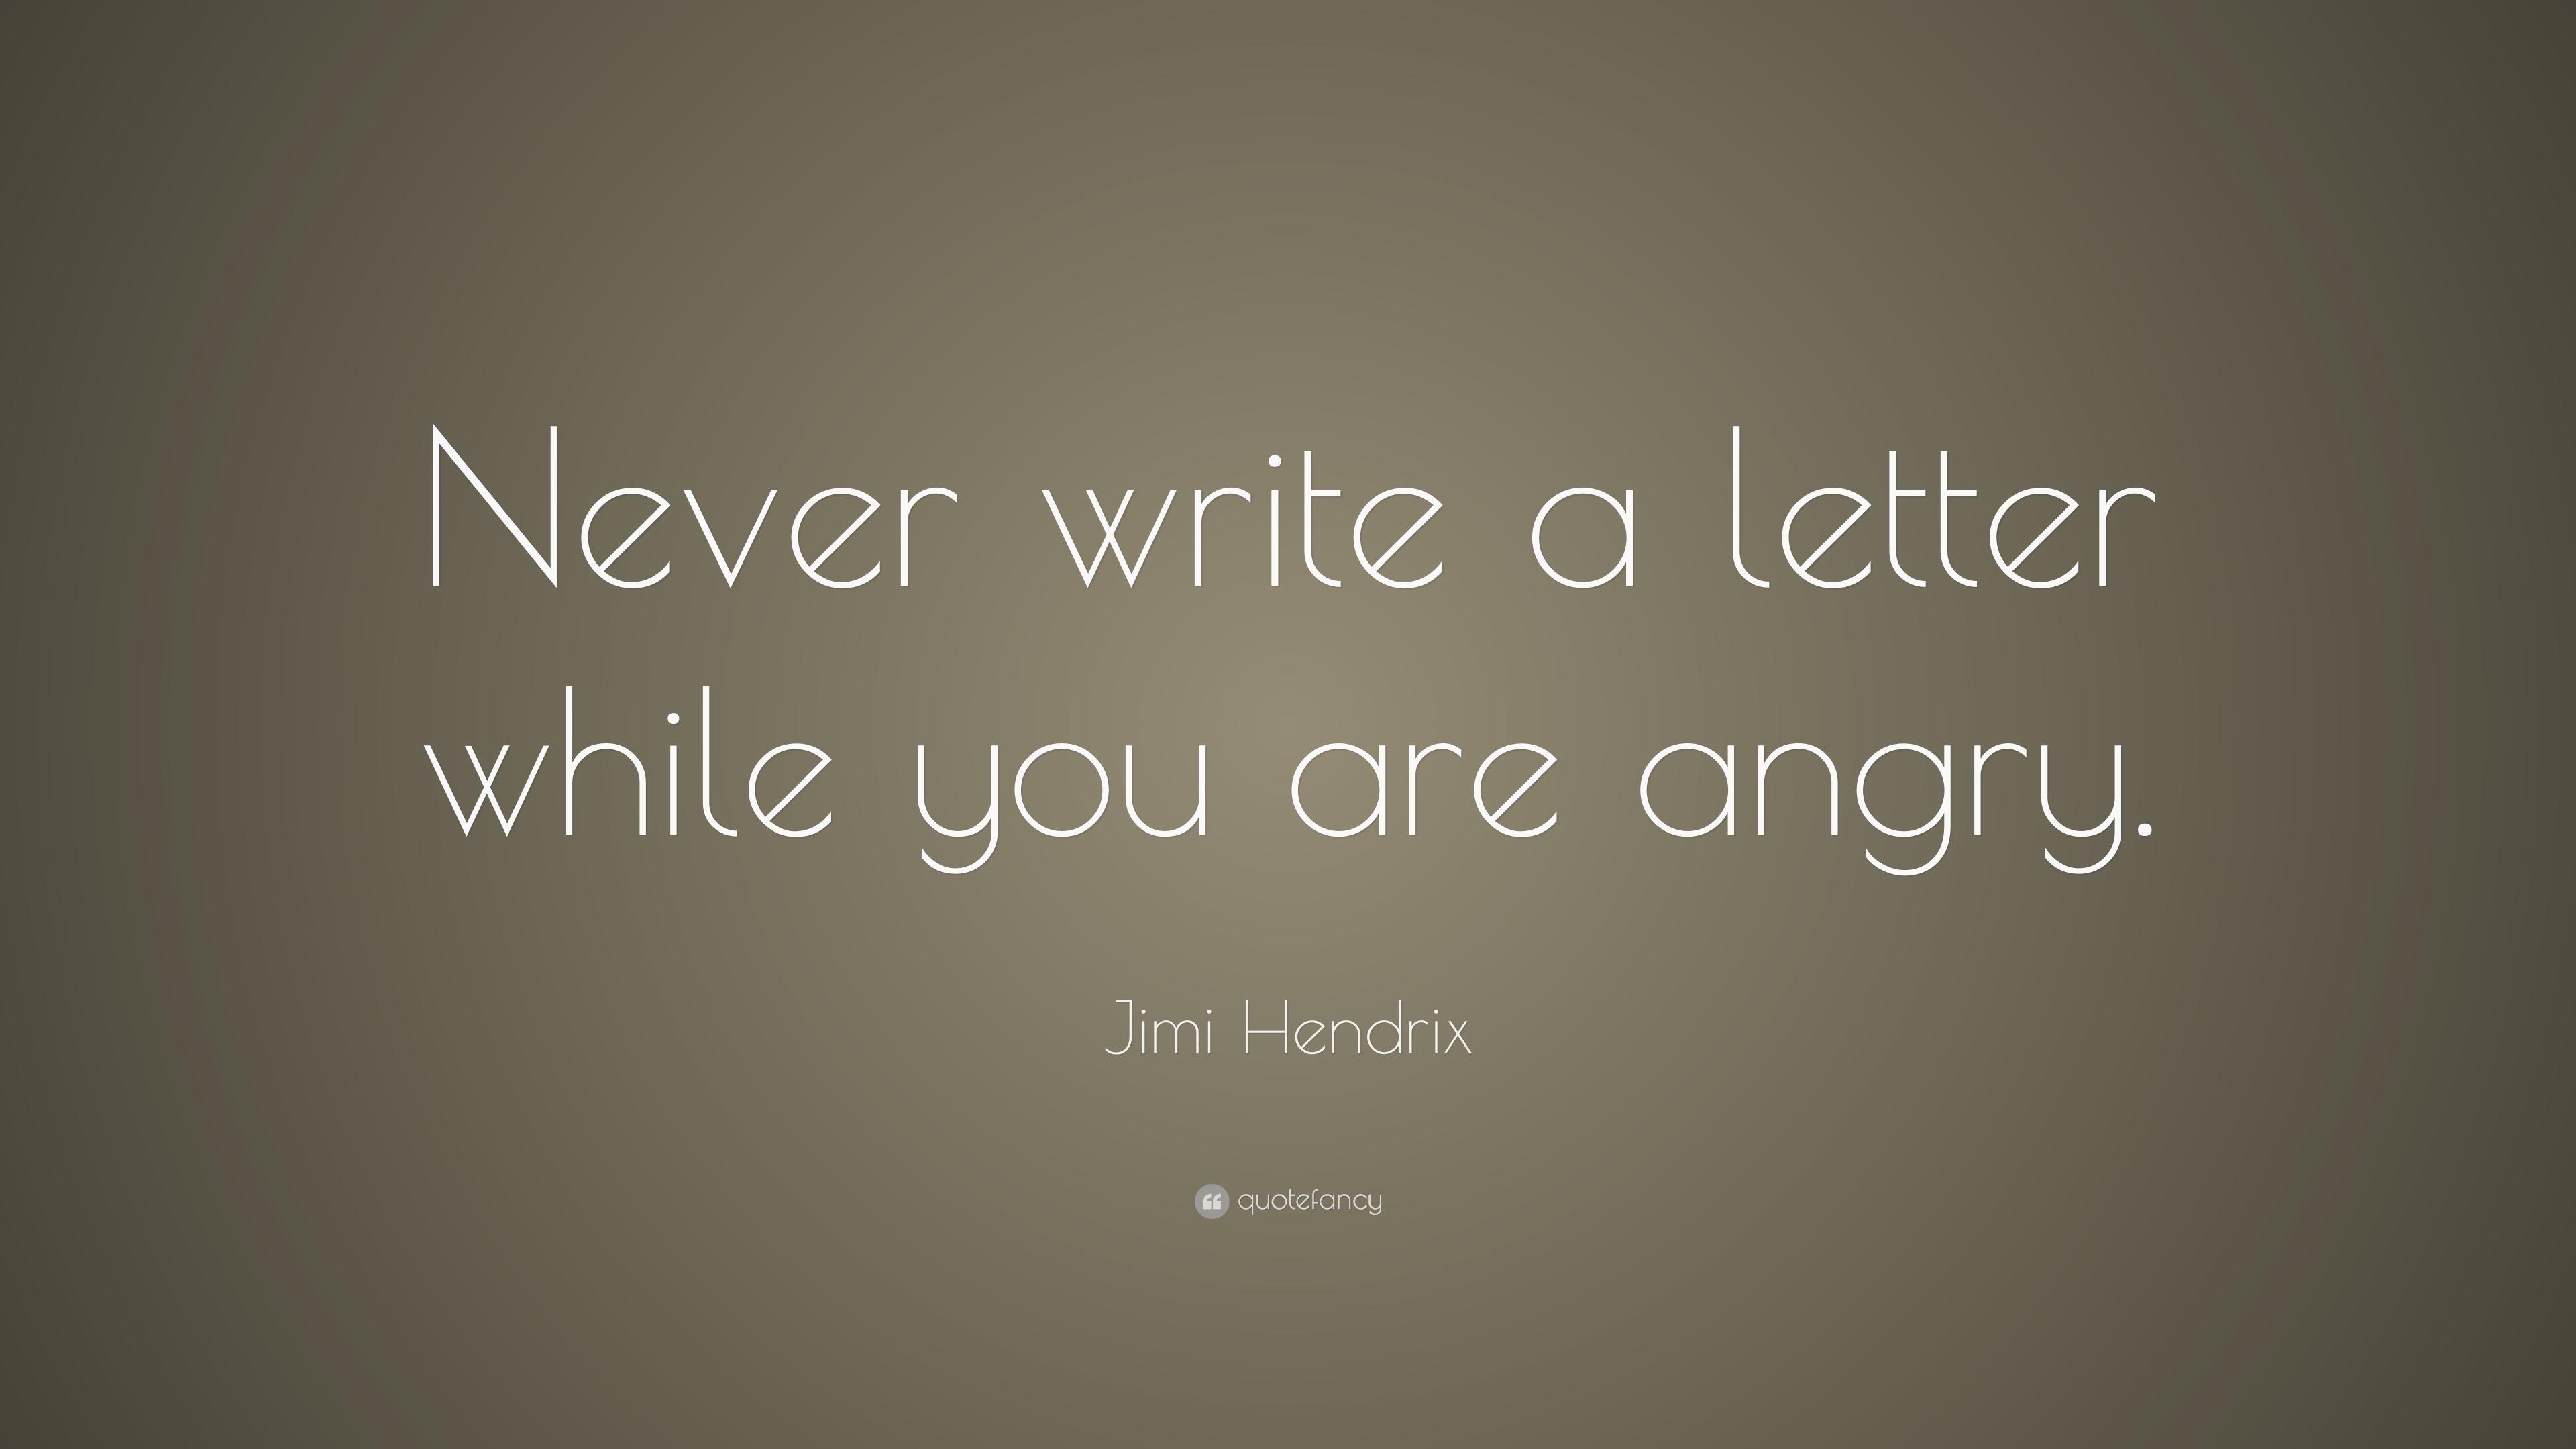 jimi hendrix writing style